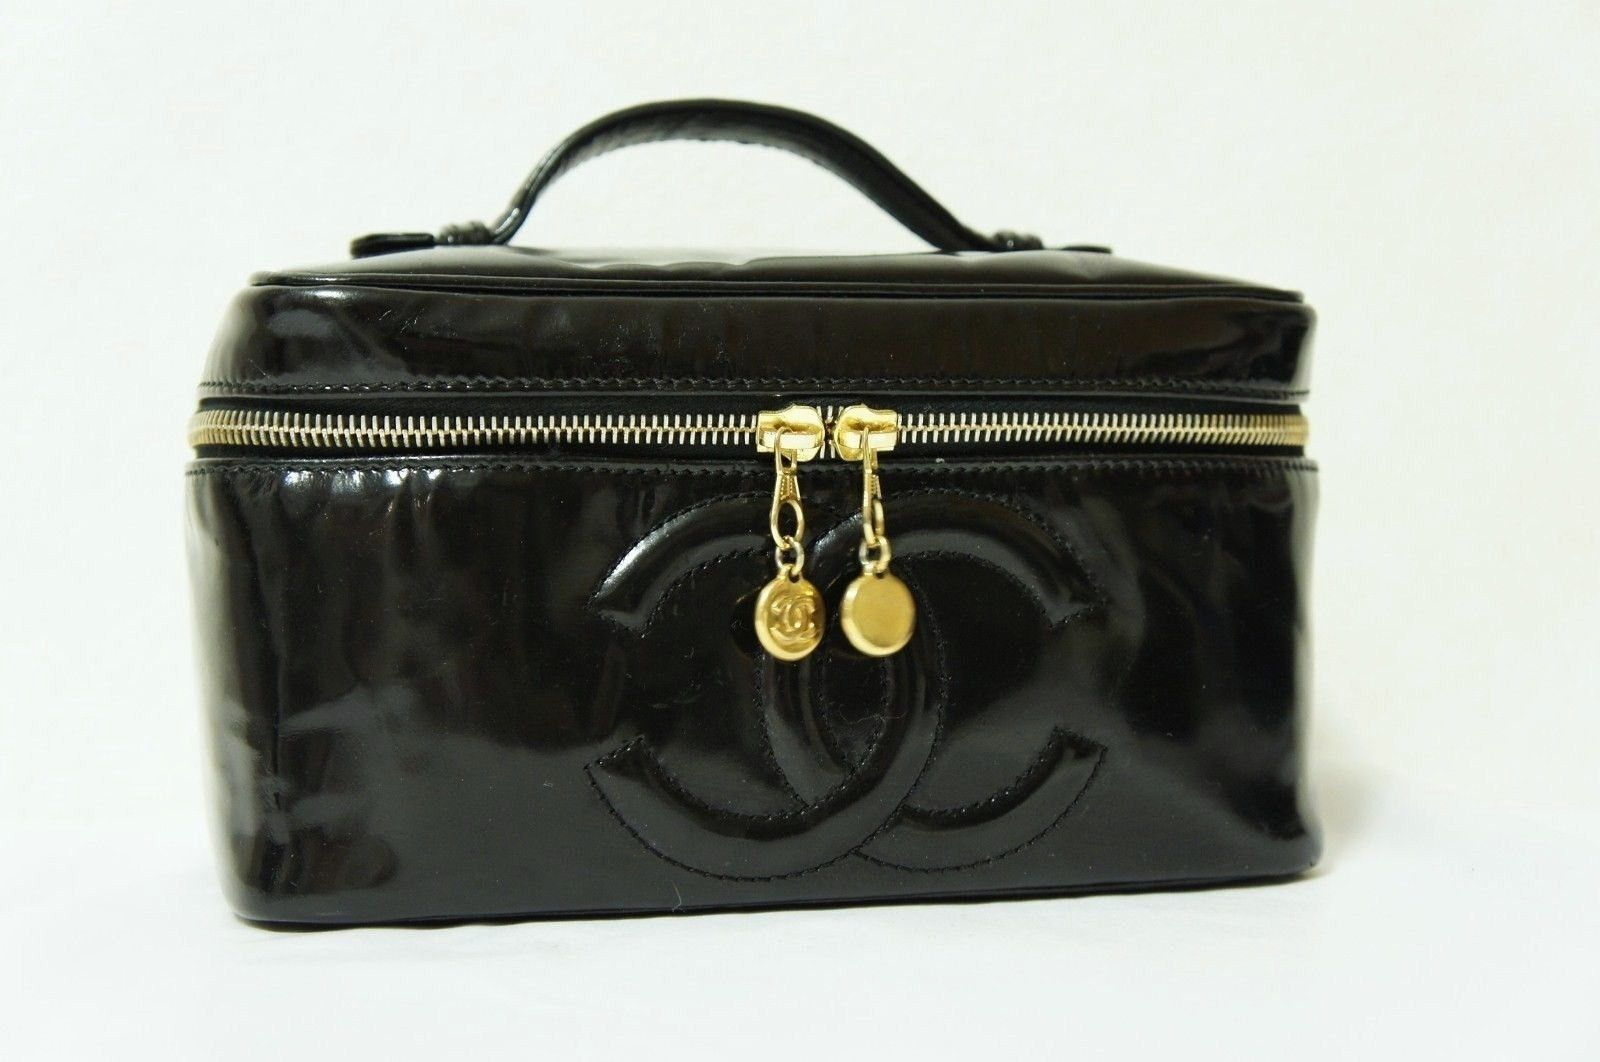 Chanel Black Make Up Travel Case Cc Patent Leather Full